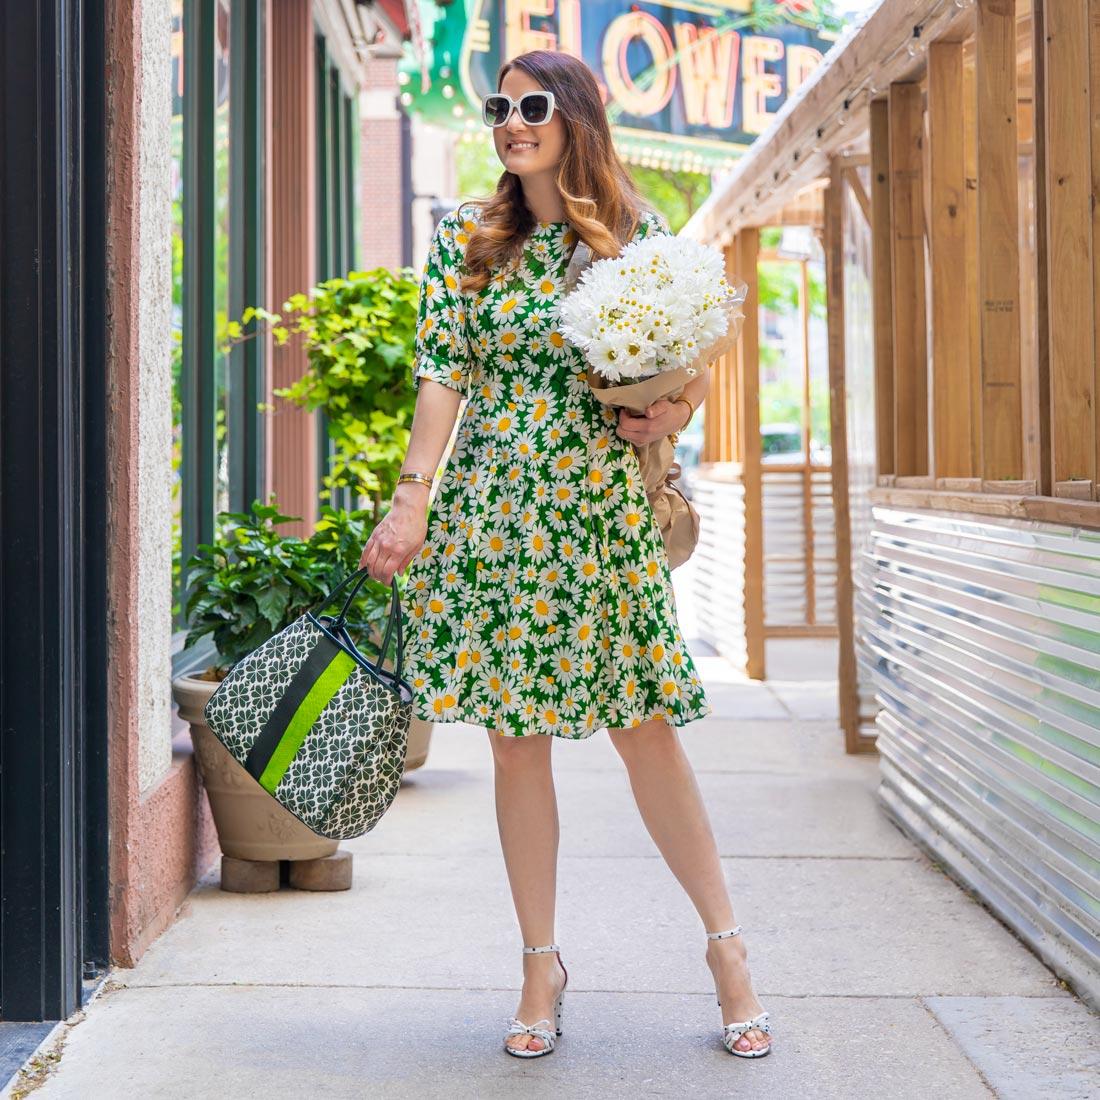 Jennifer Lake Kate Spade Floral Dress